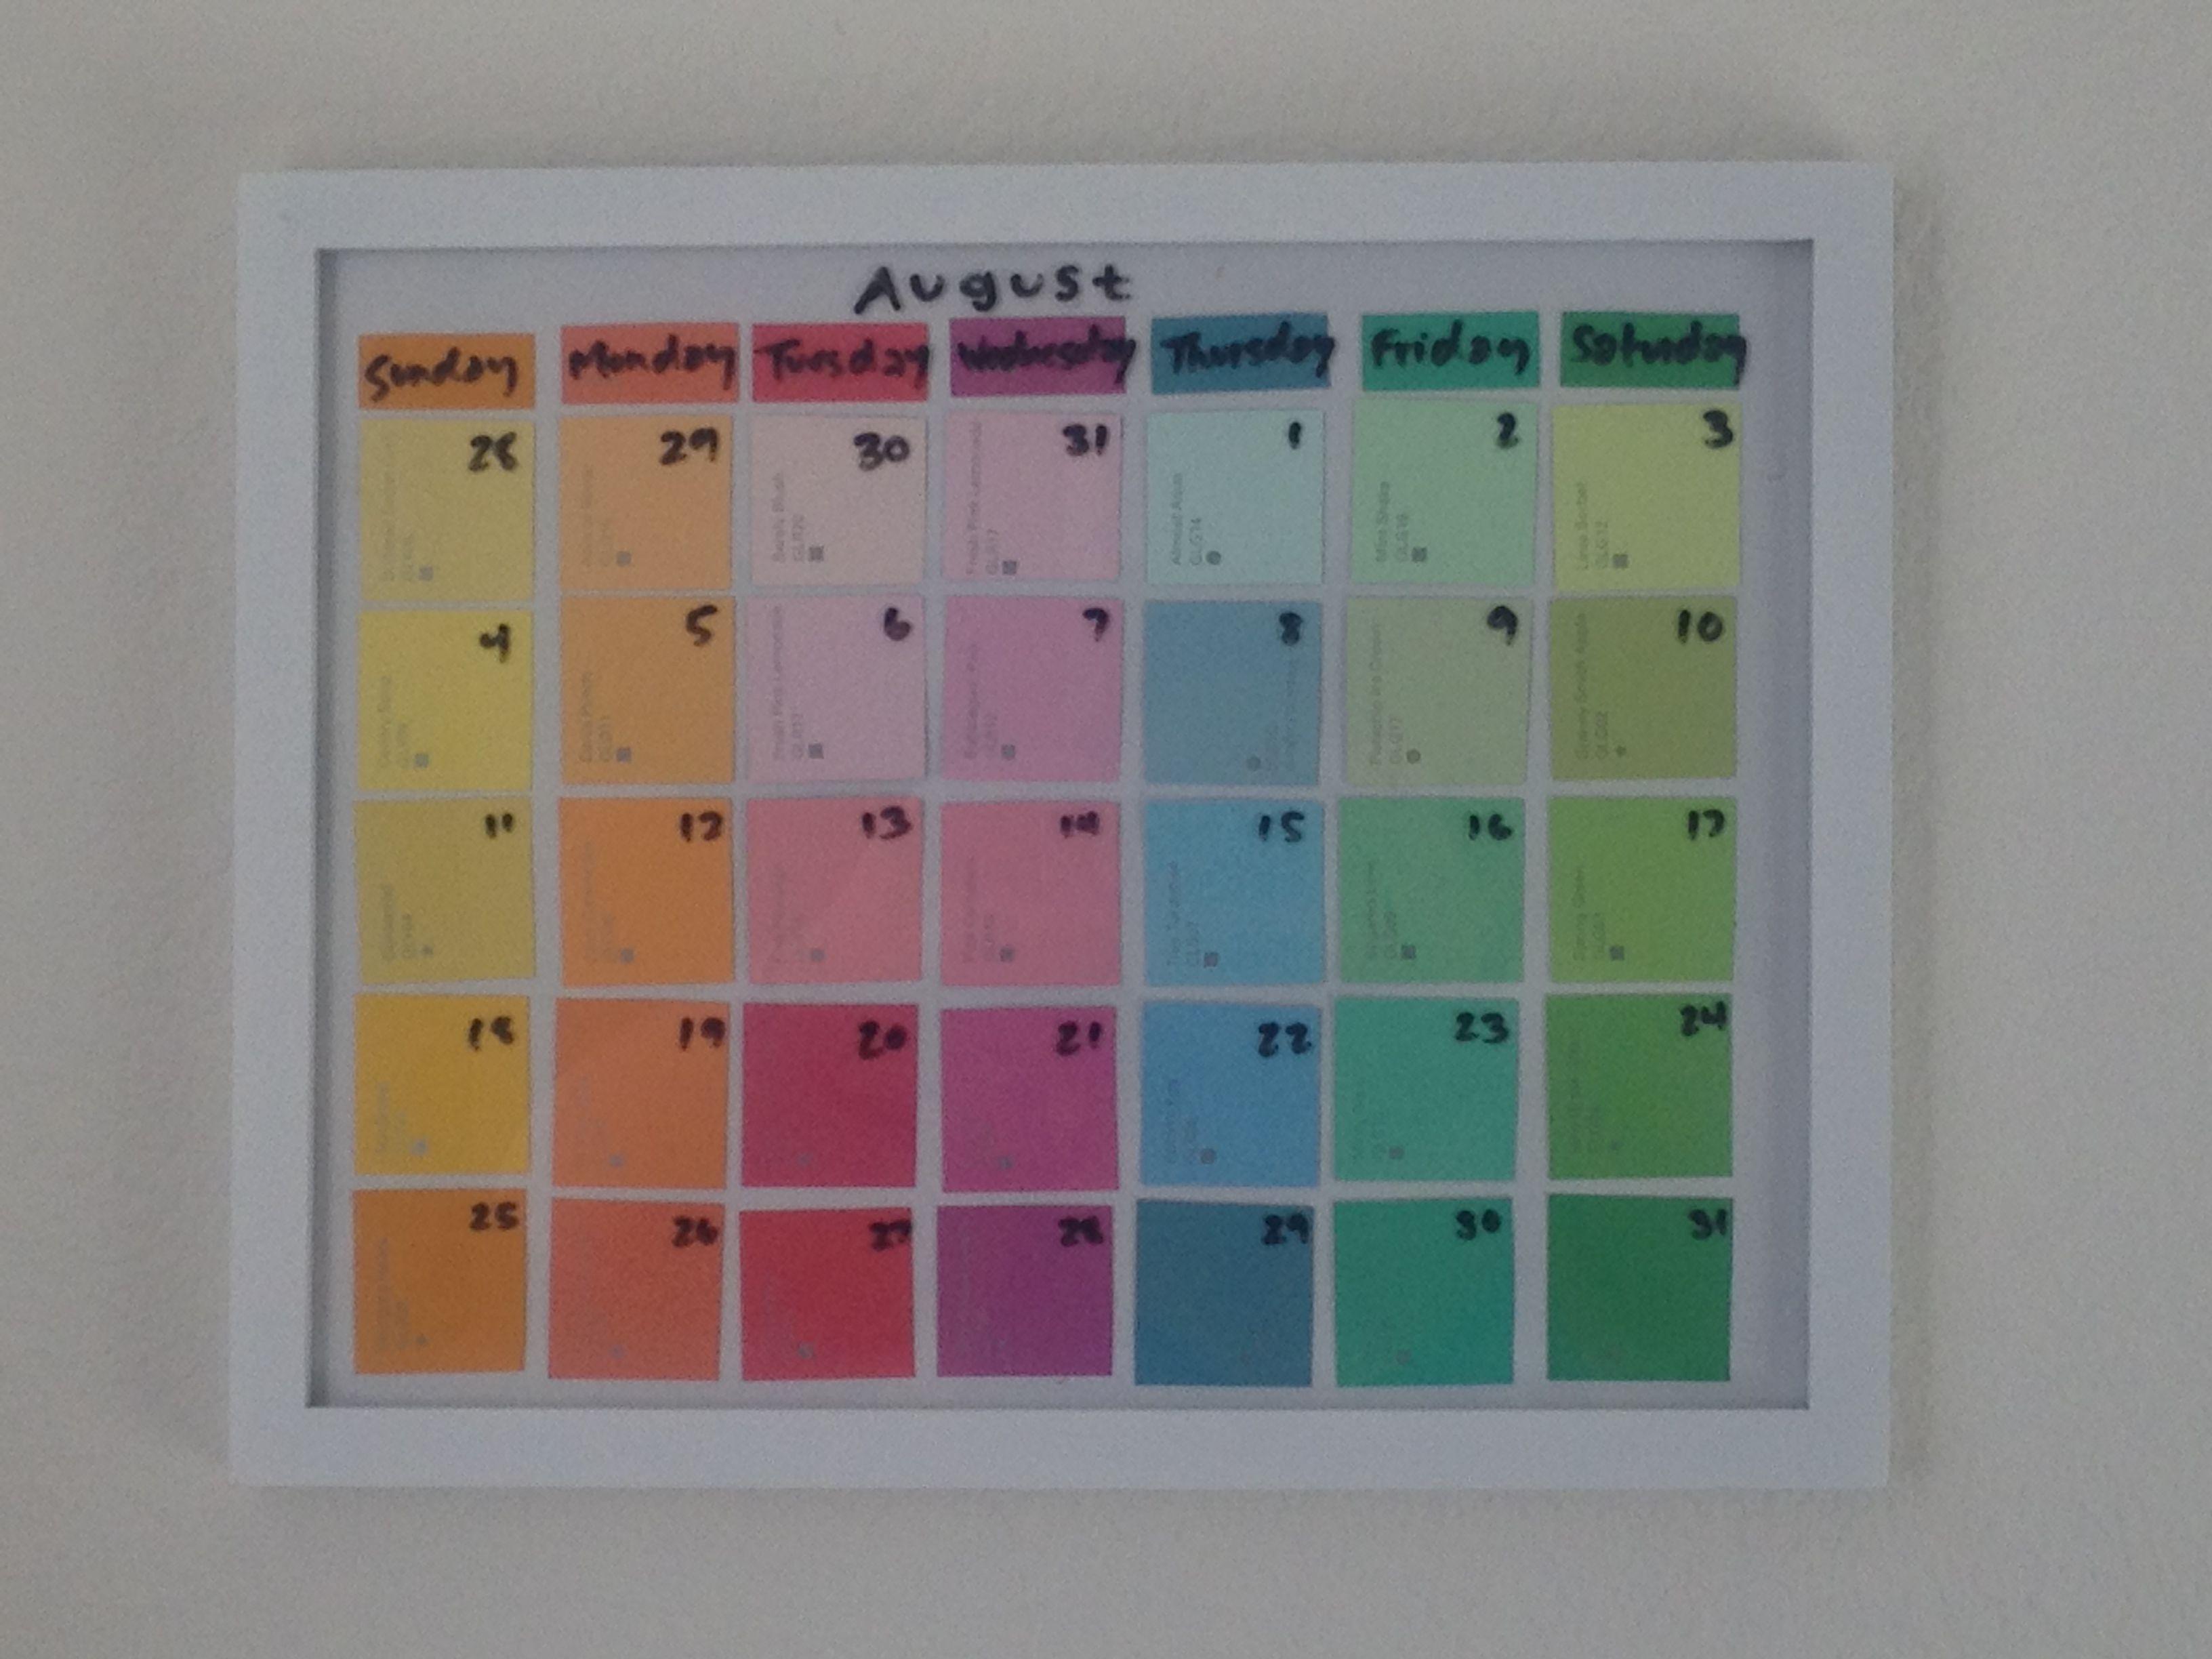 Paint Sample Calendar Diy : Paint swatch calendar also great for a chore chart use